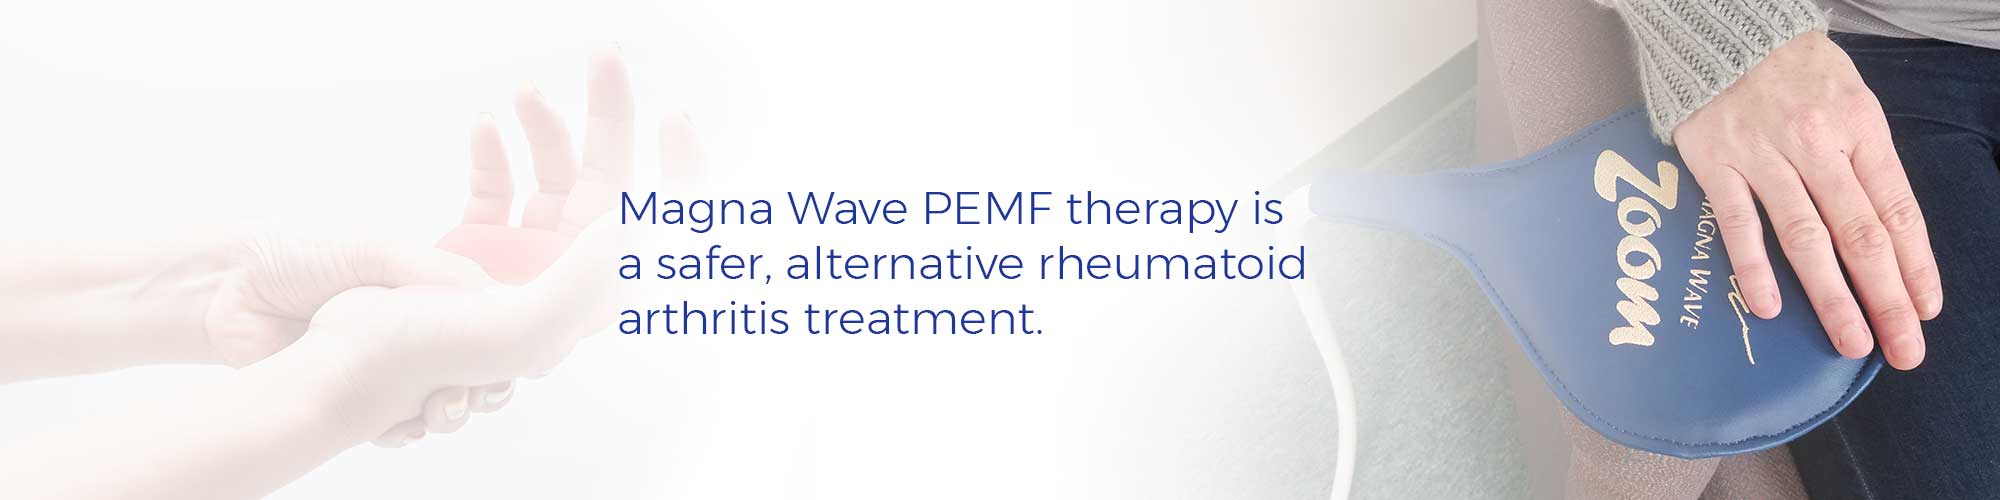 Magna Wave PEMF therapy is a safer, alternative rheumatoid arthritis treatment.